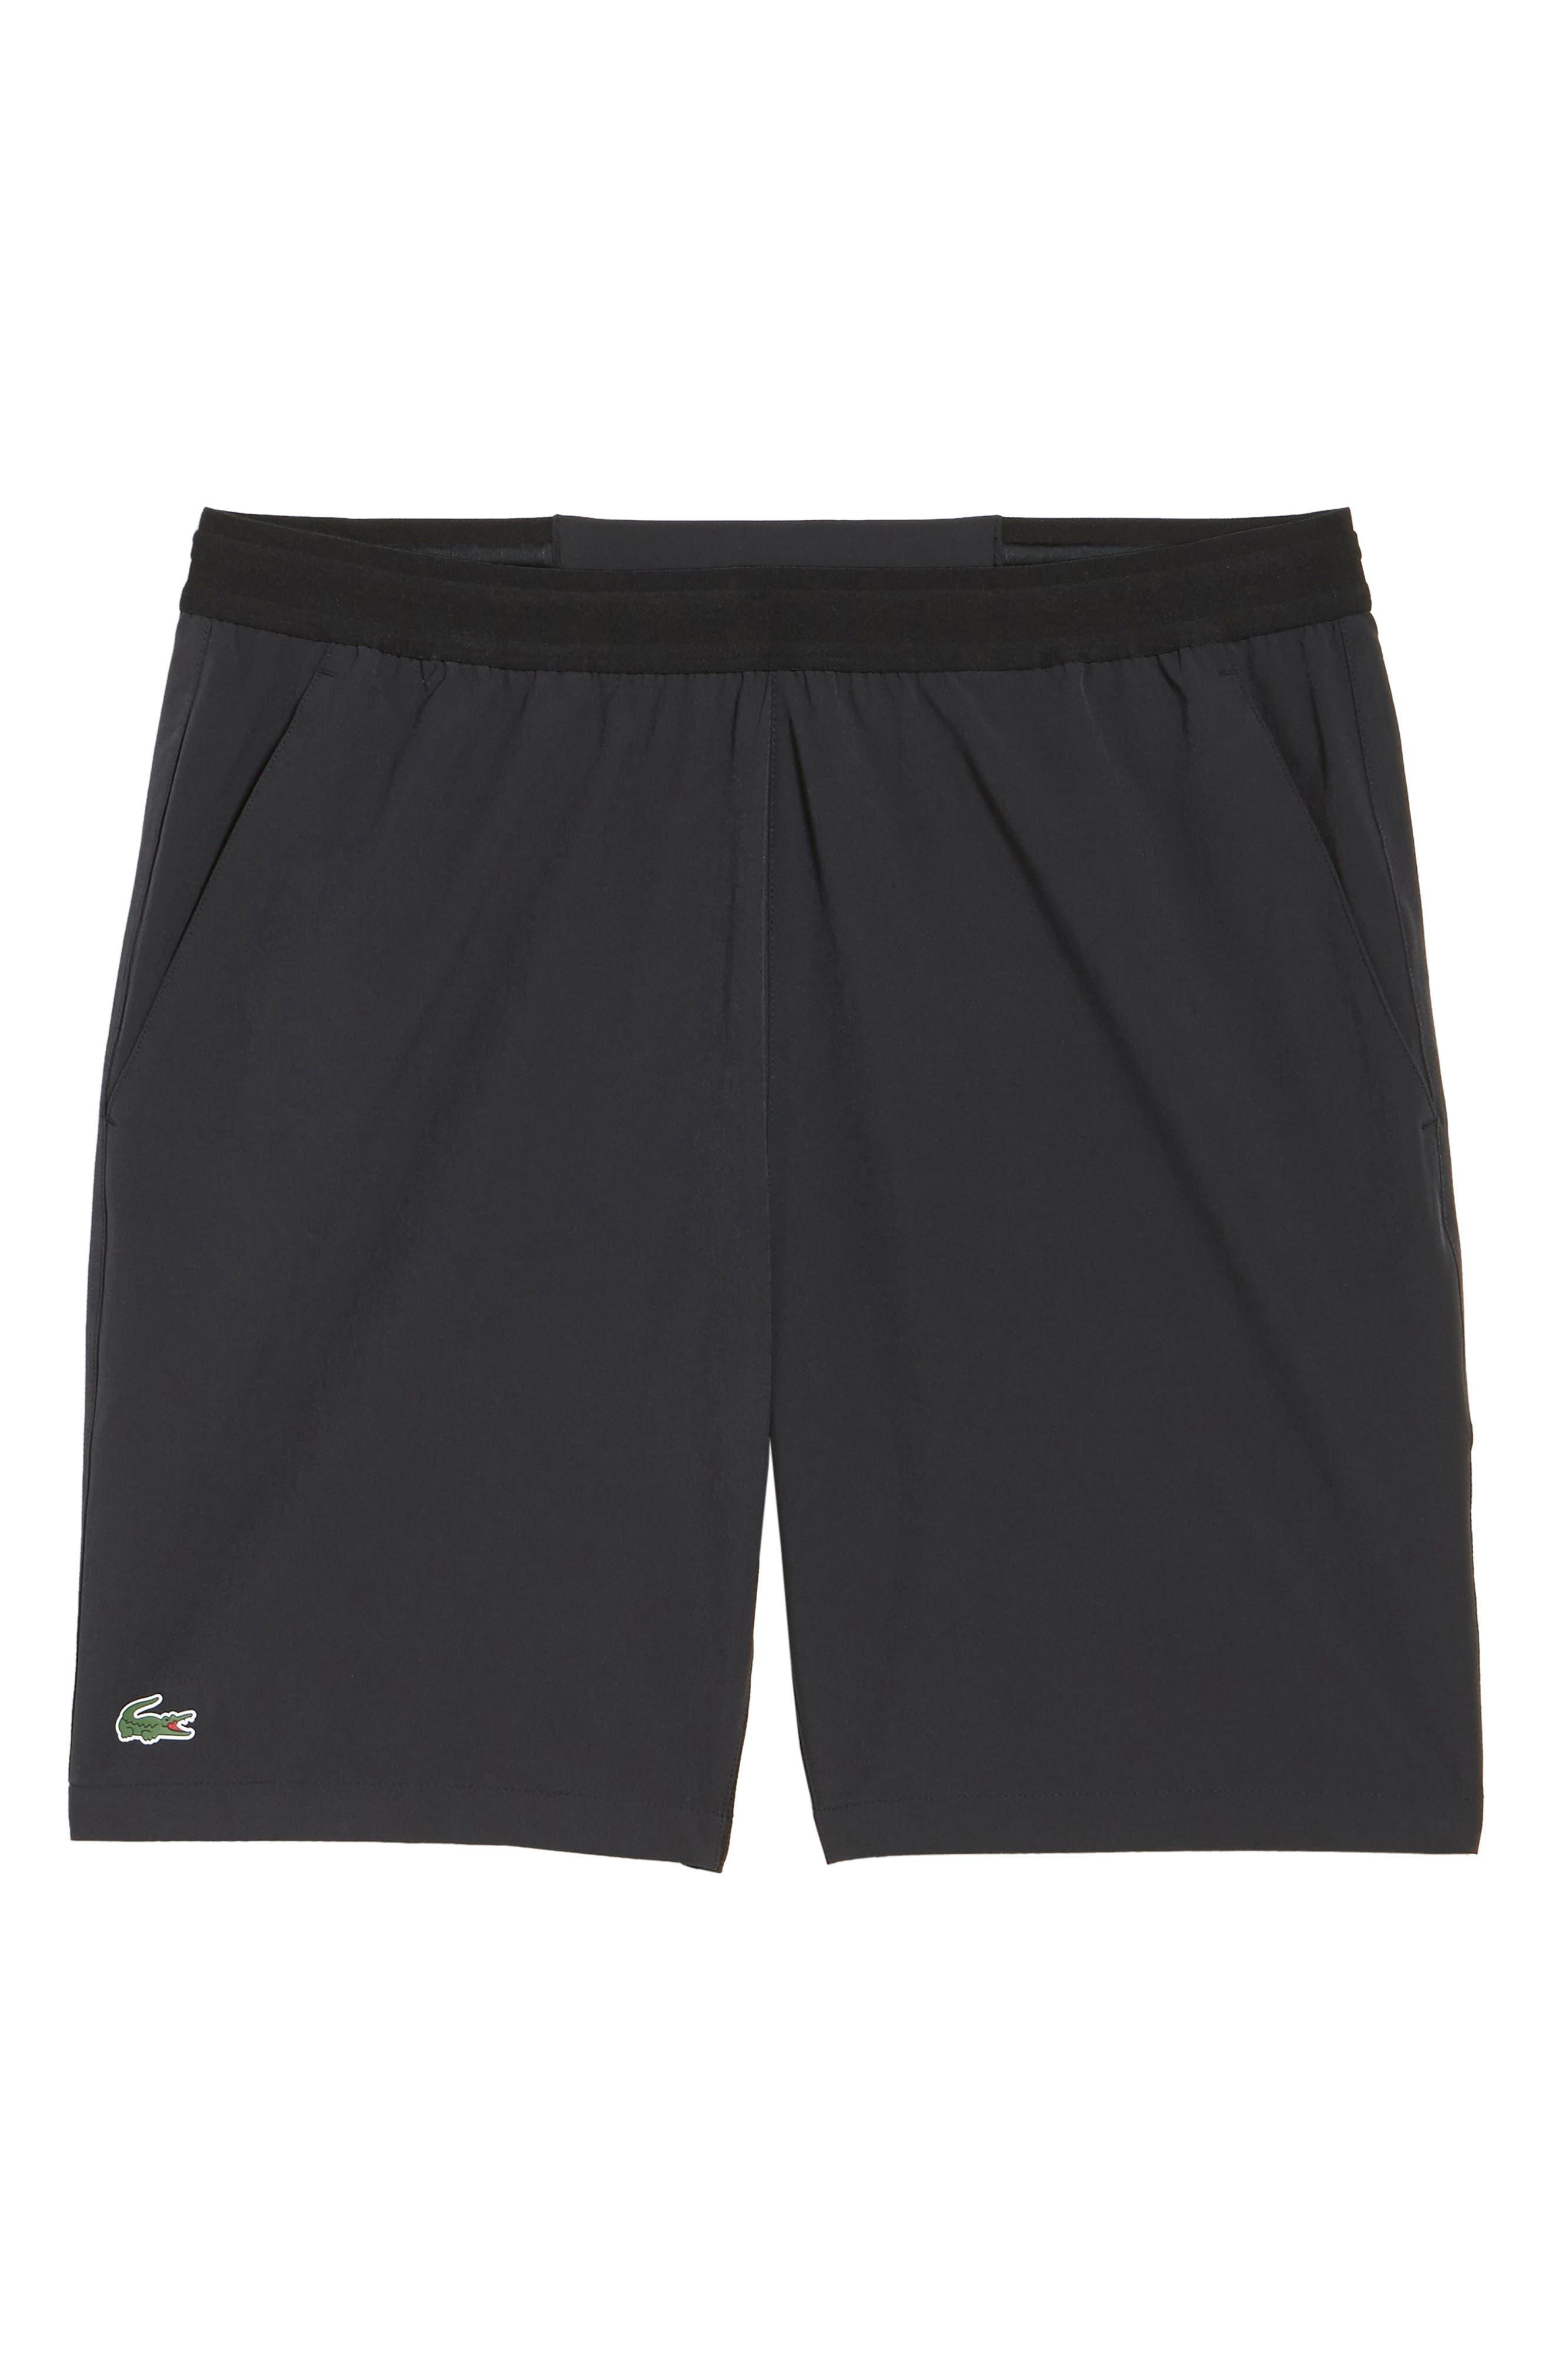 Stretch Sport Shorts,                             Alternate thumbnail 6, color,                             Black